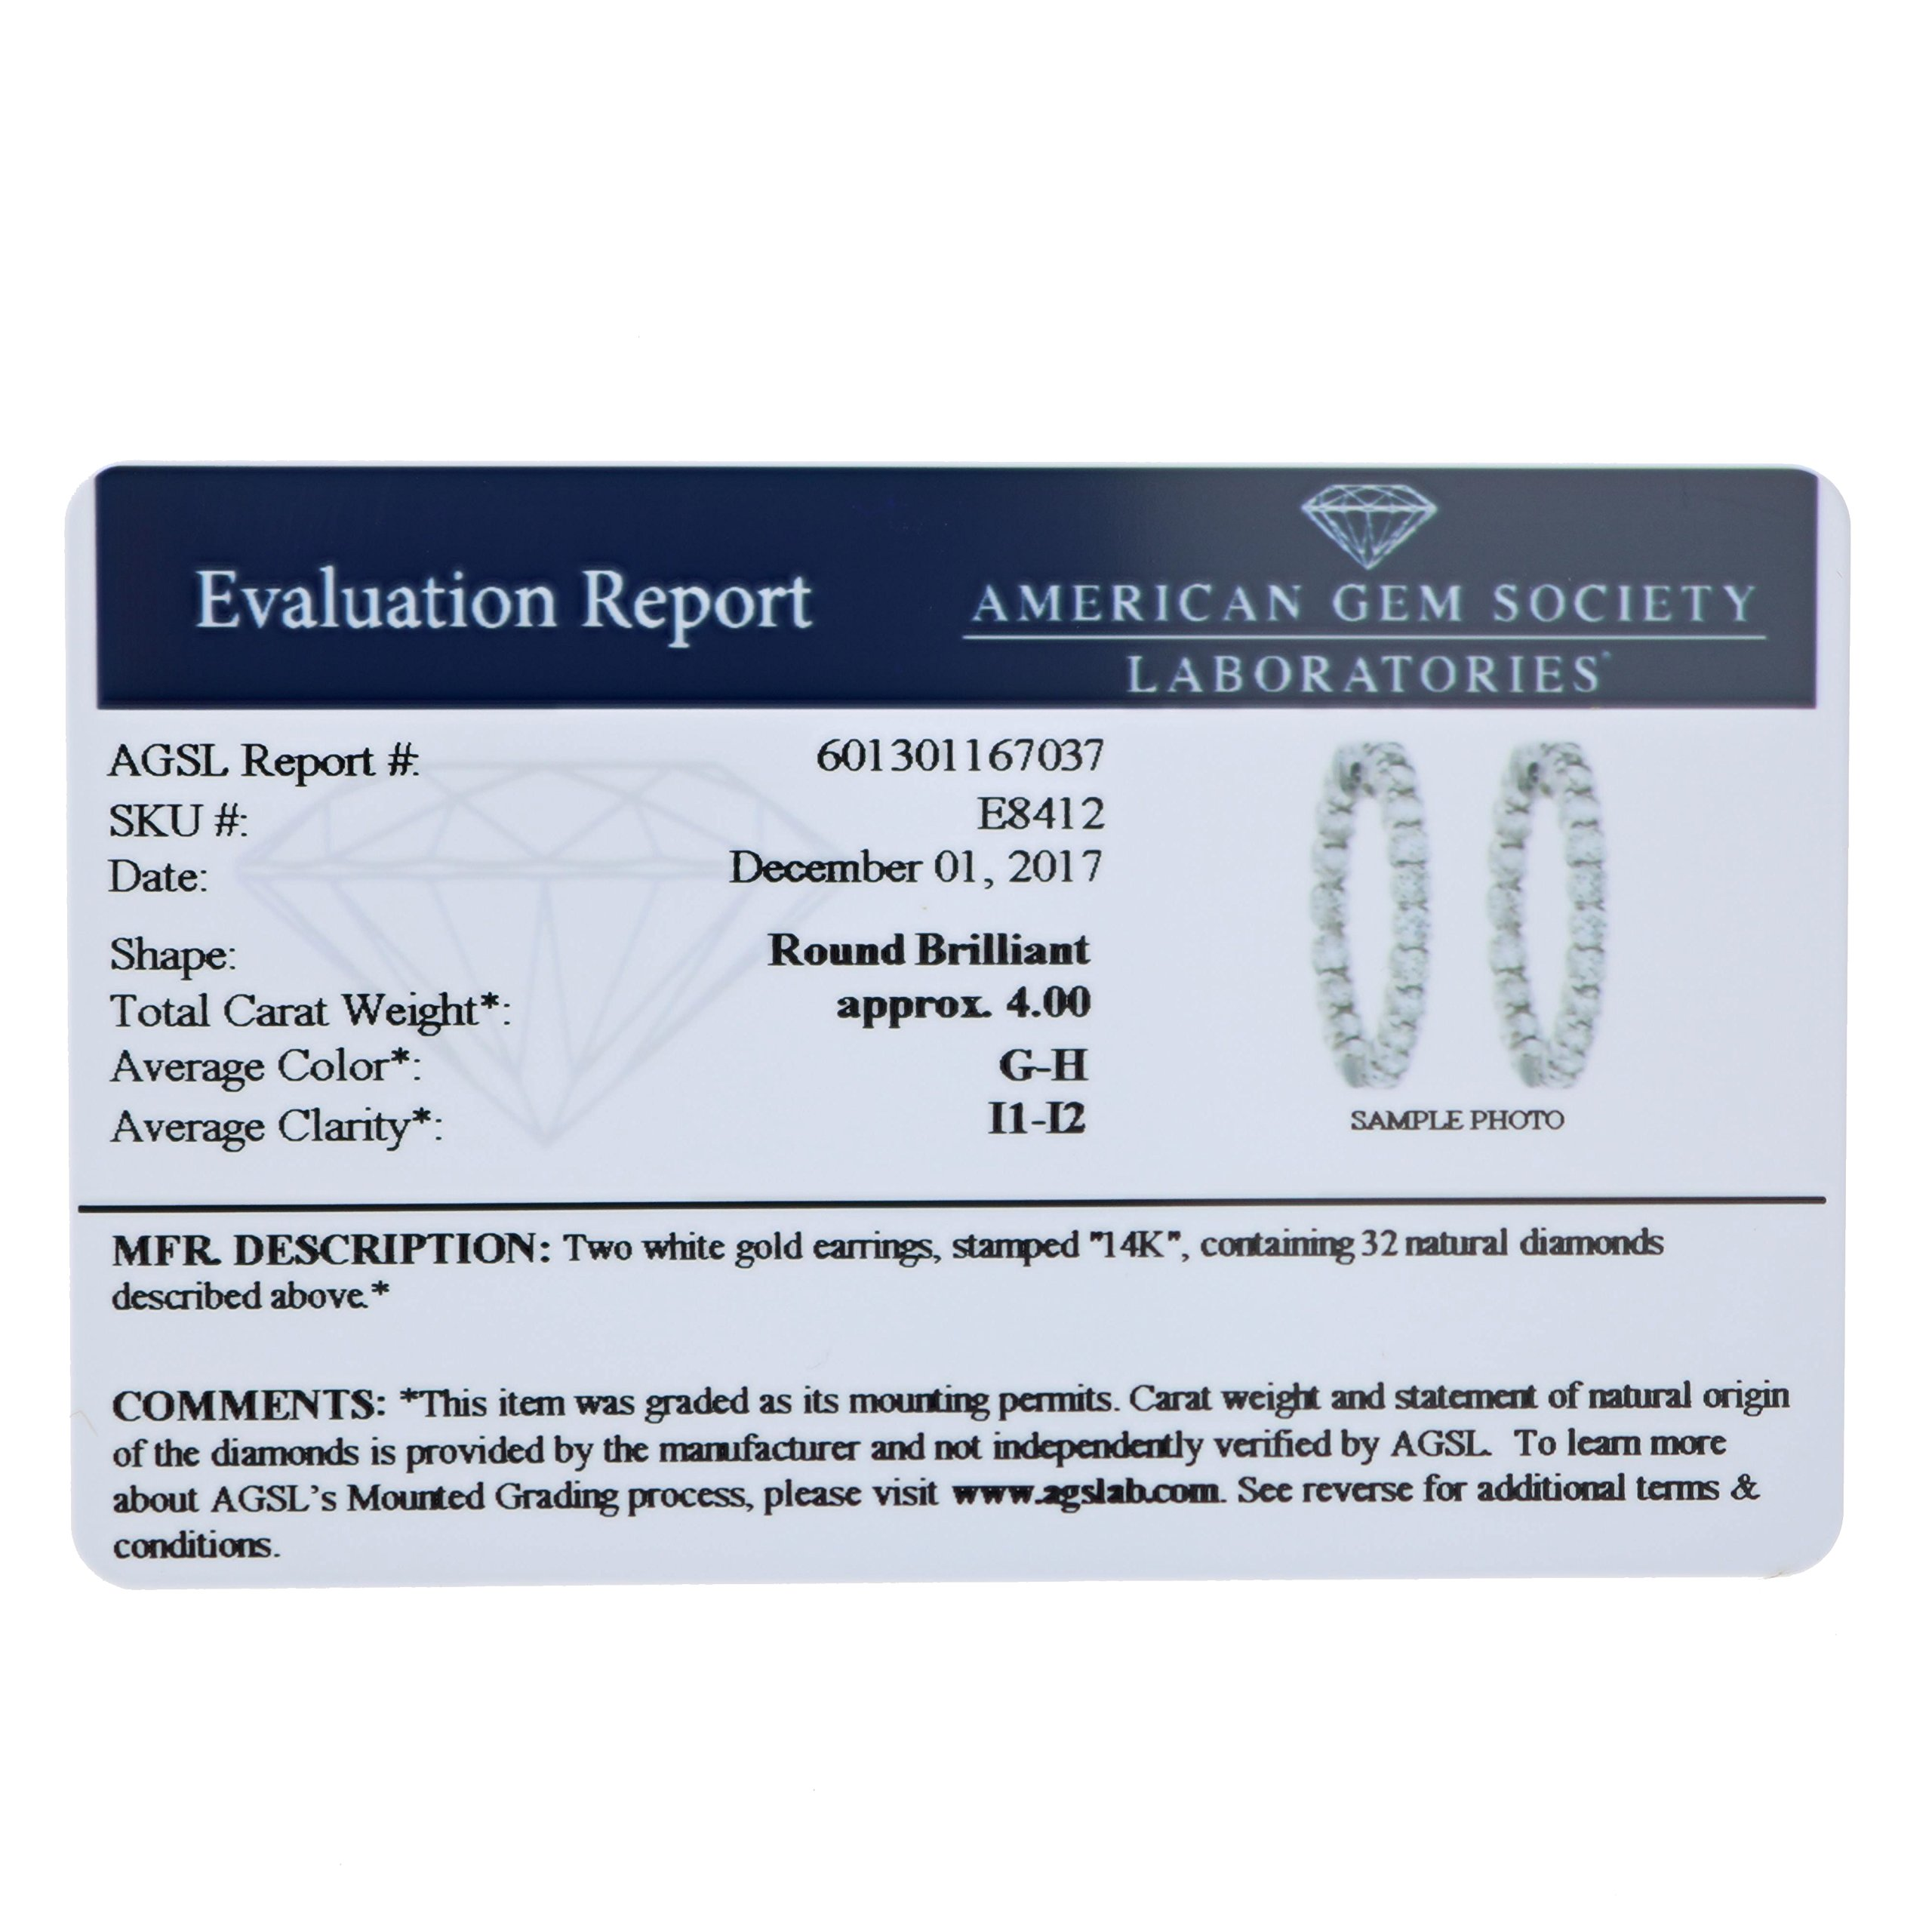 4 cttw SI2-I1 Certified 14K White Gold Diamond Inside Out Hoop Earrings (J-K) by Vir Jewels (Image #2)